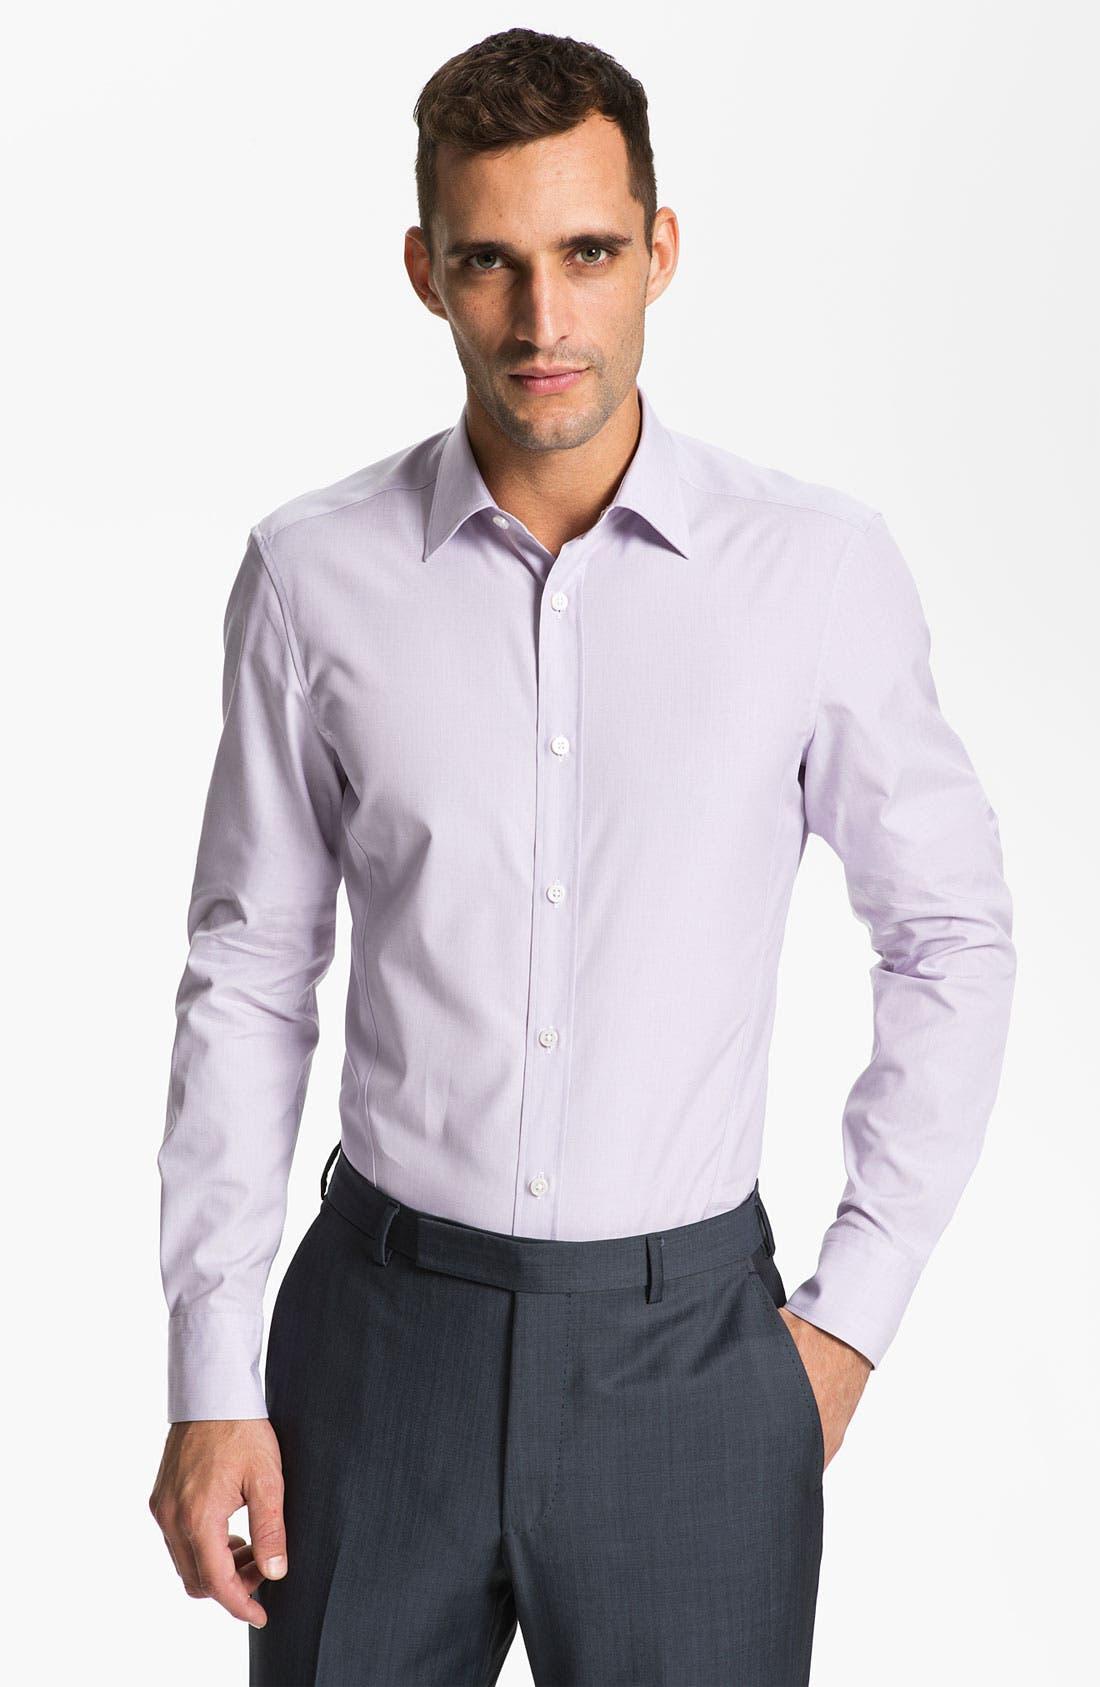 Alternate Image 1 Selected - Z Zegna Extra Trim Fit Dress Shirt